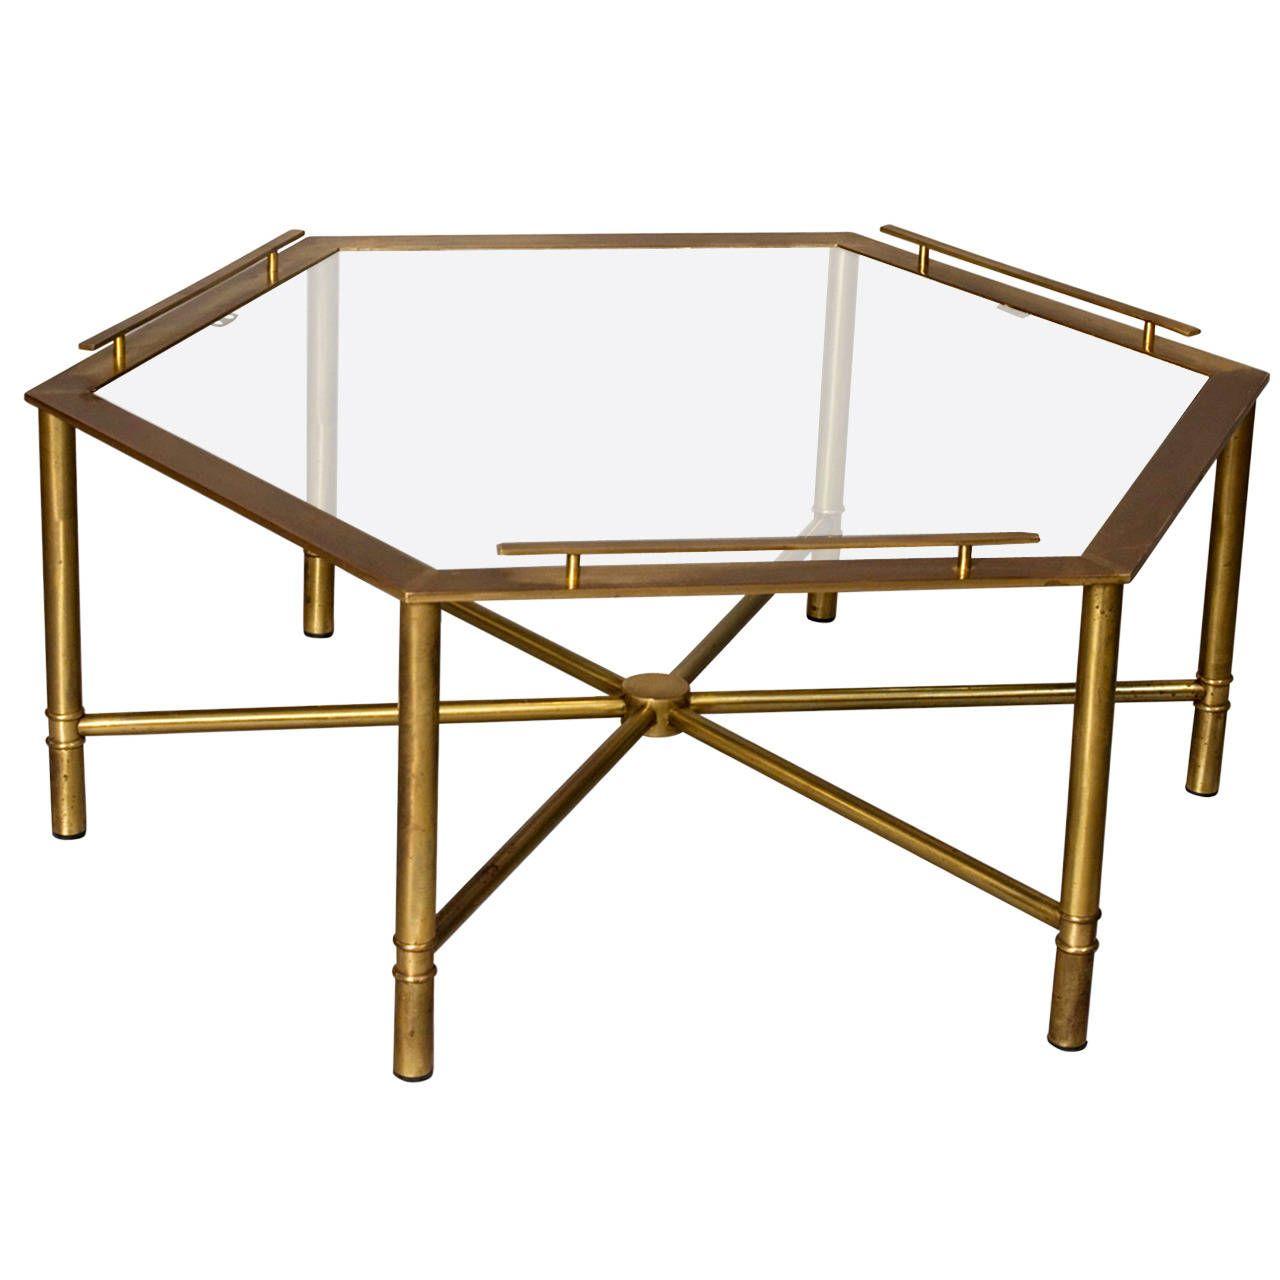 Bronze Hex Coffee Table By Mastercraft 1stdibs Com Hexagon Coffee Table Coffee Table Coffee Table Vintage [ 1280 x 1280 Pixel ]